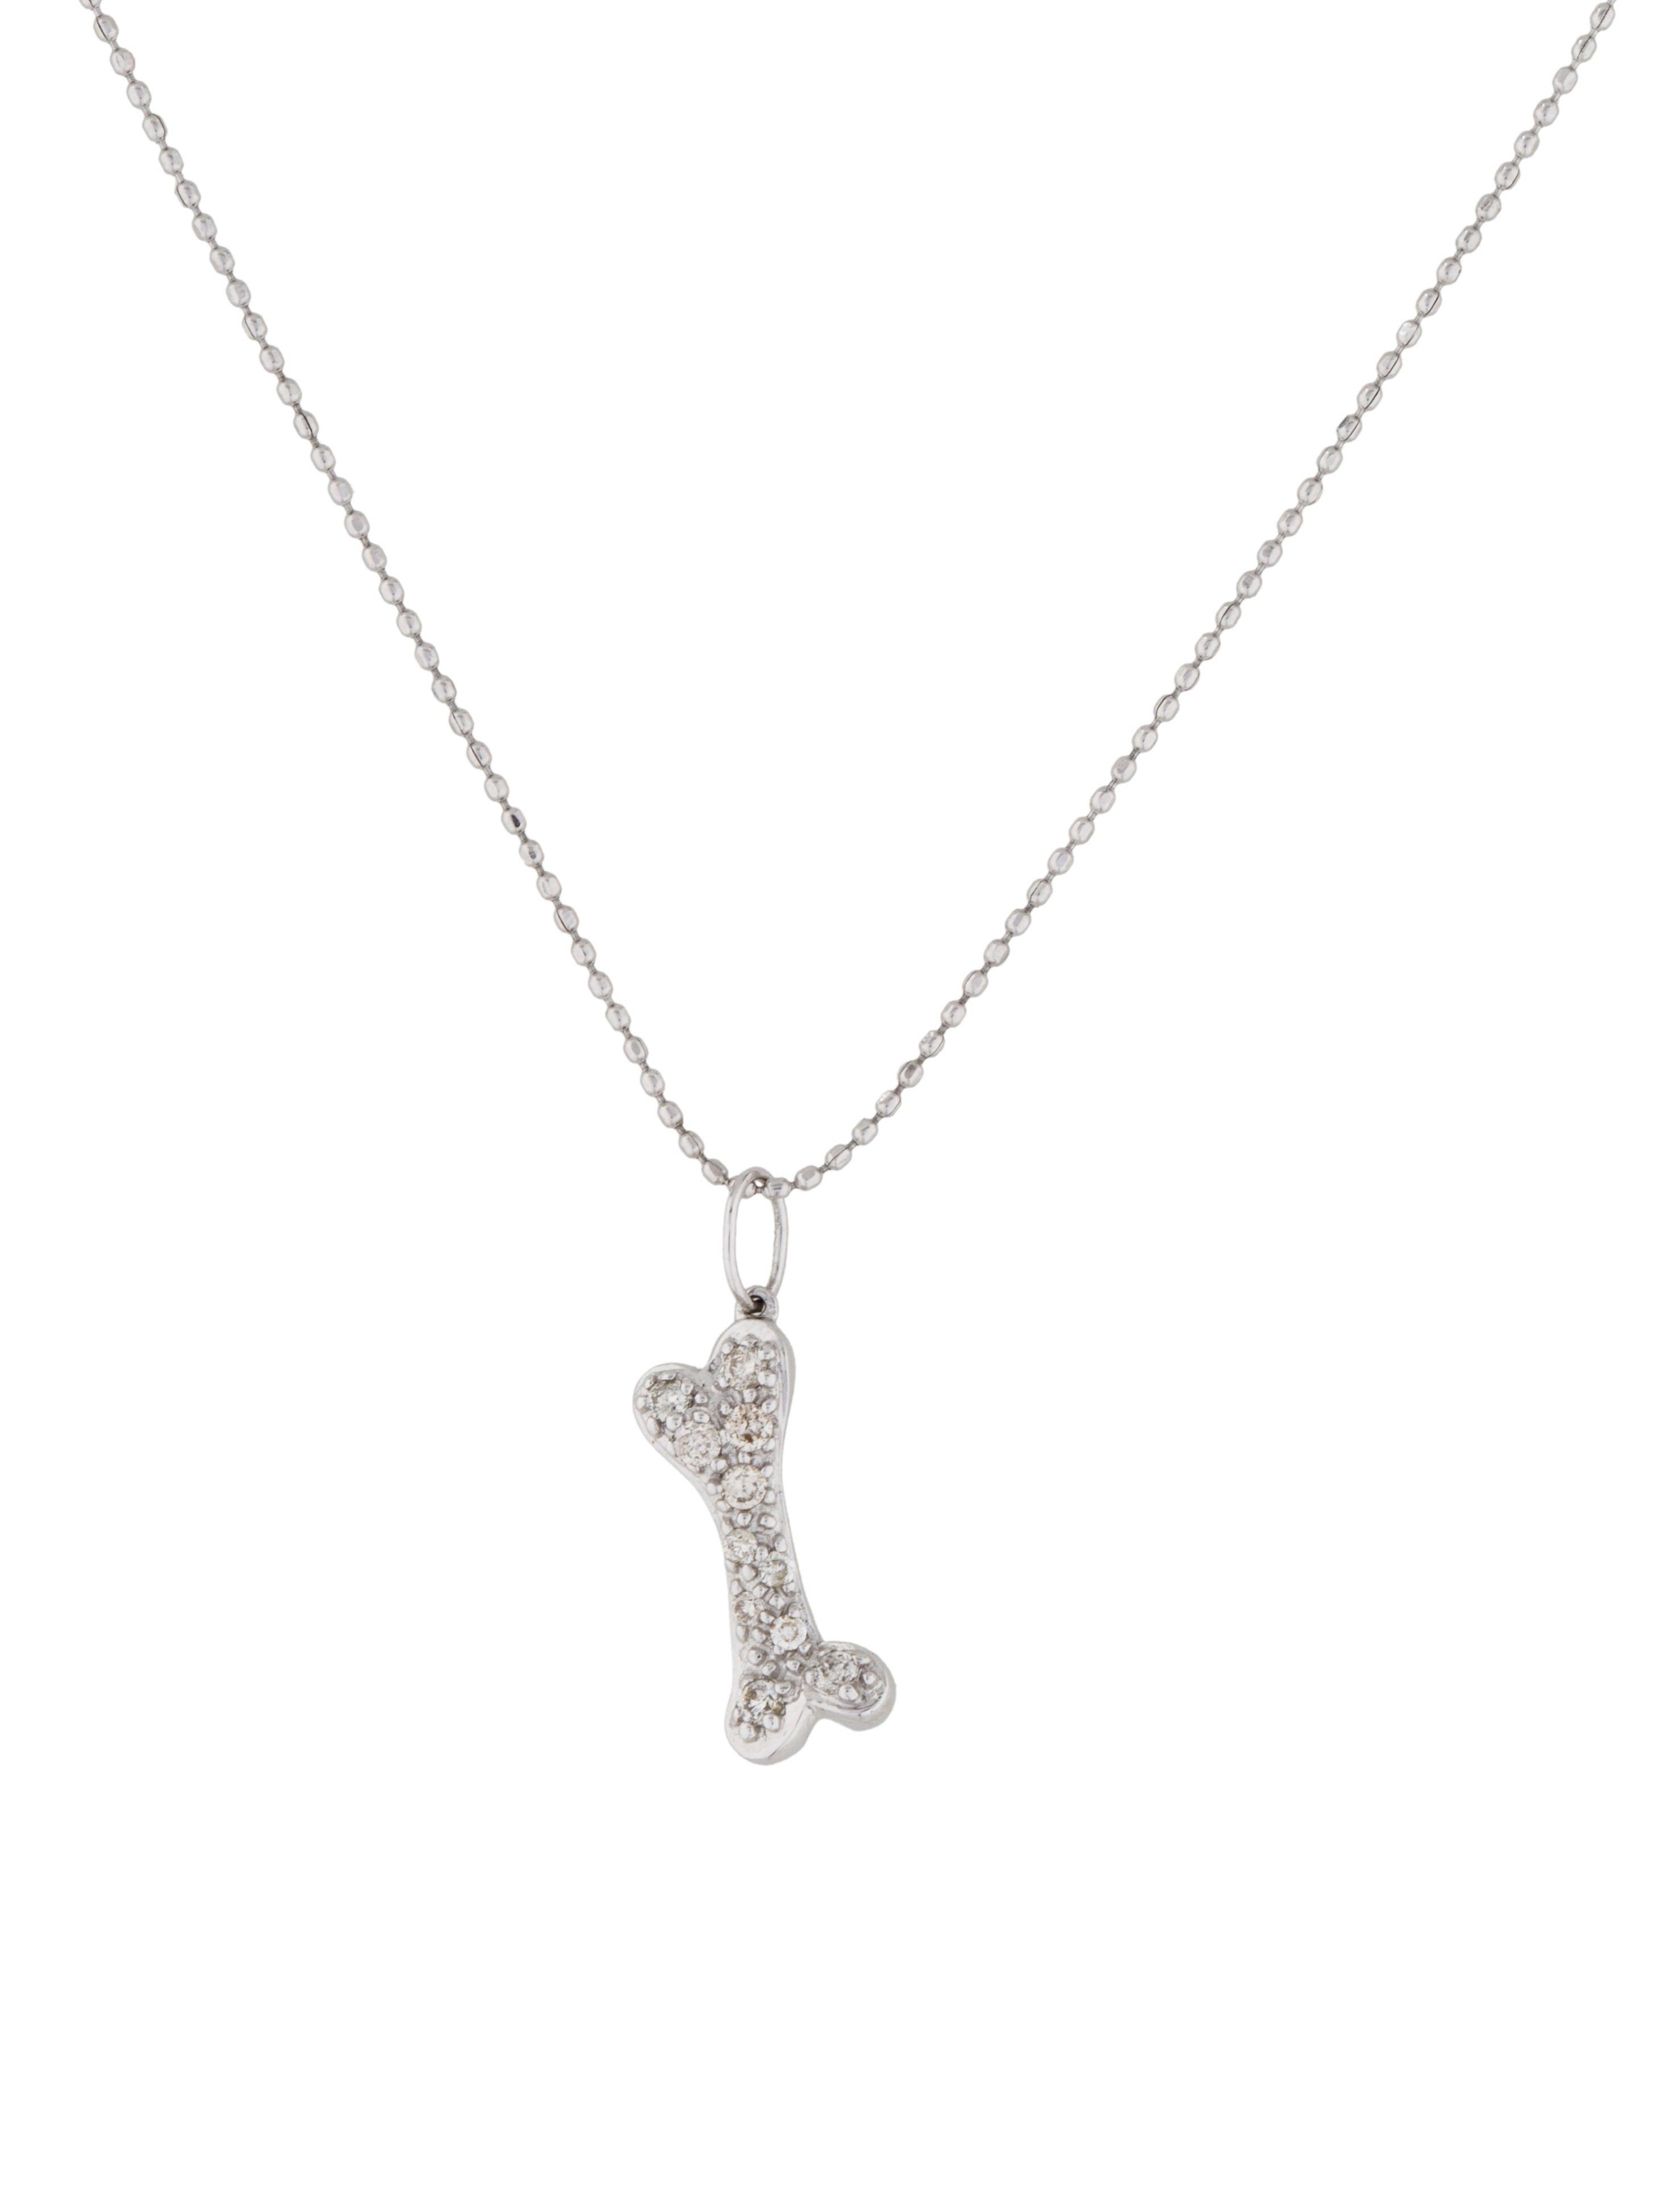 Sydney Evan Diamond Dogbone Pendant Necklace Necklaces